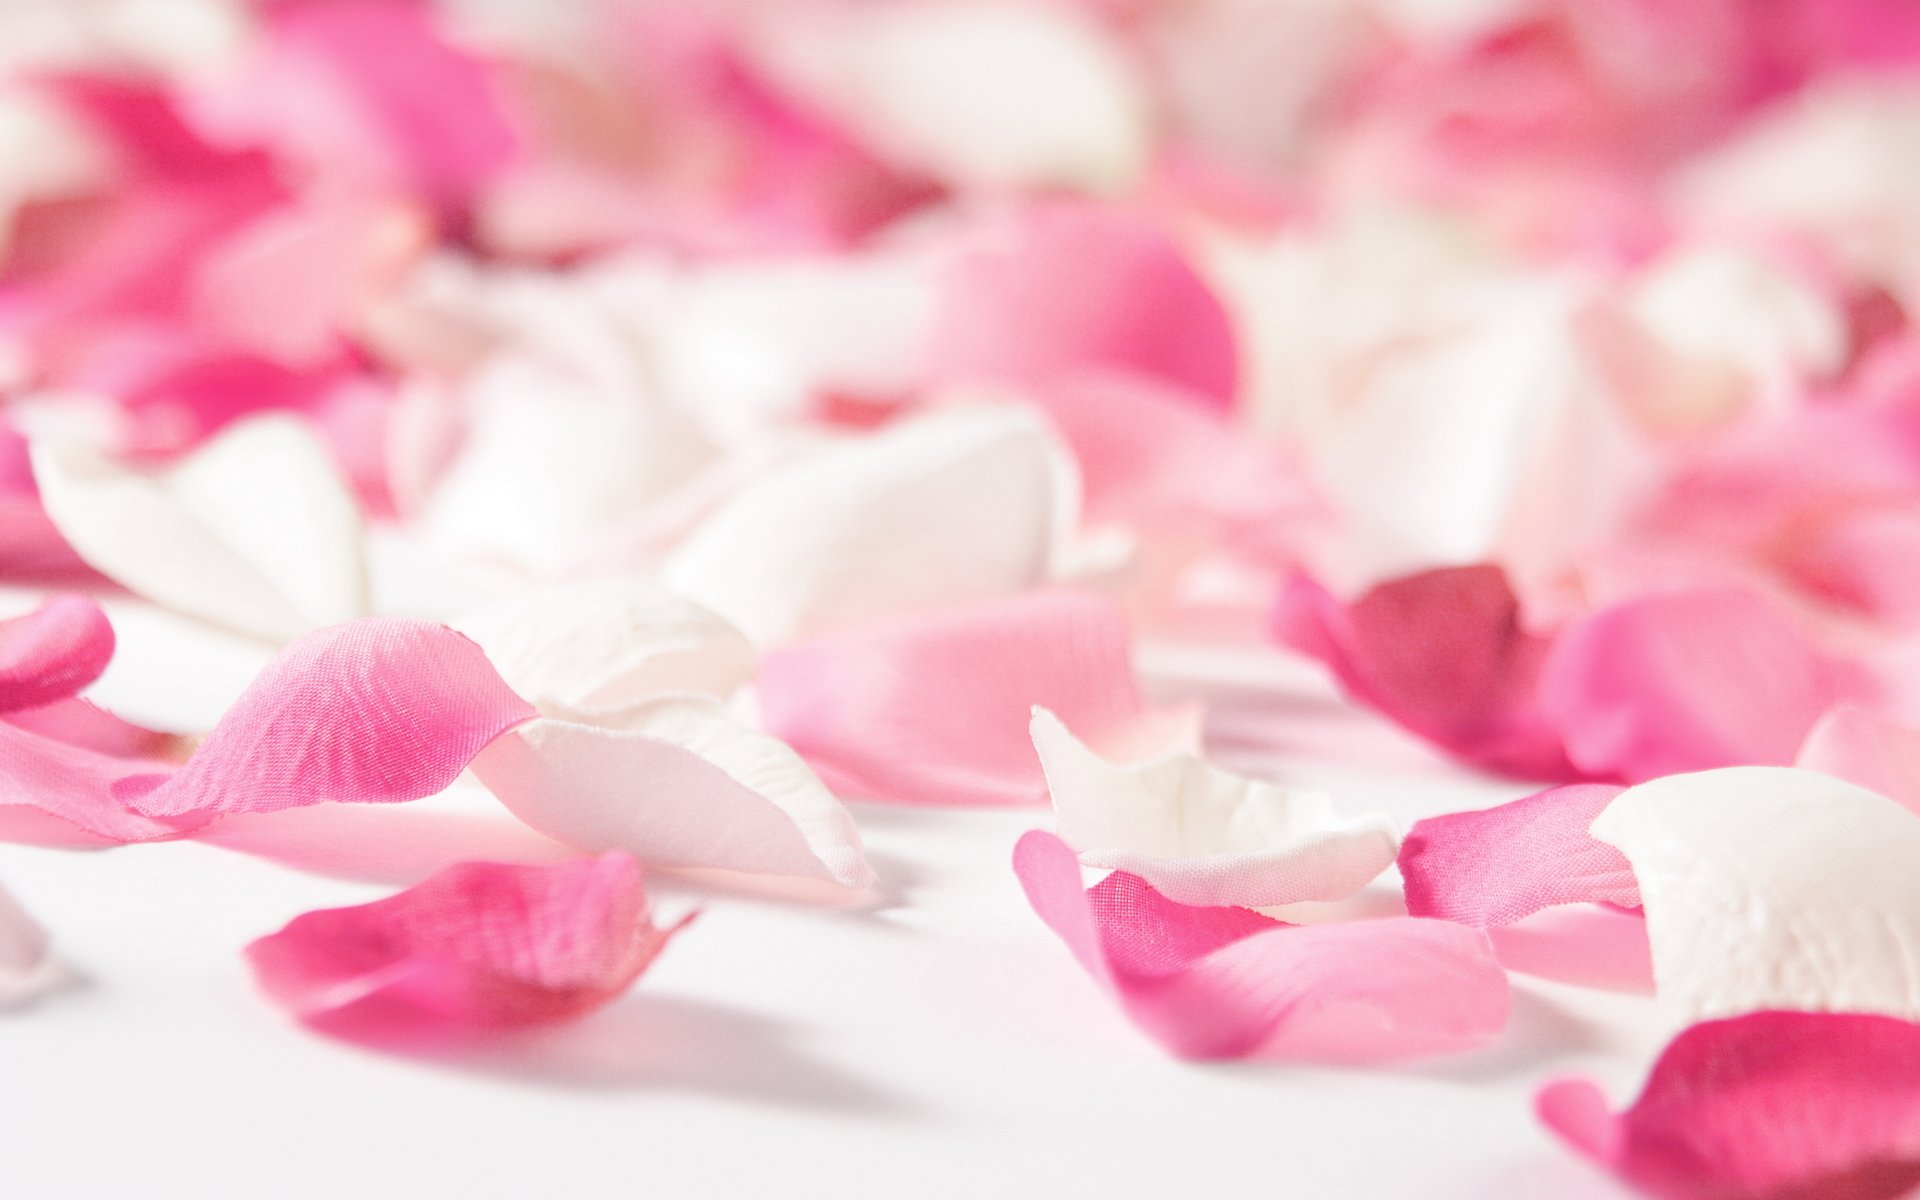 цветок частицы лепестки без смс